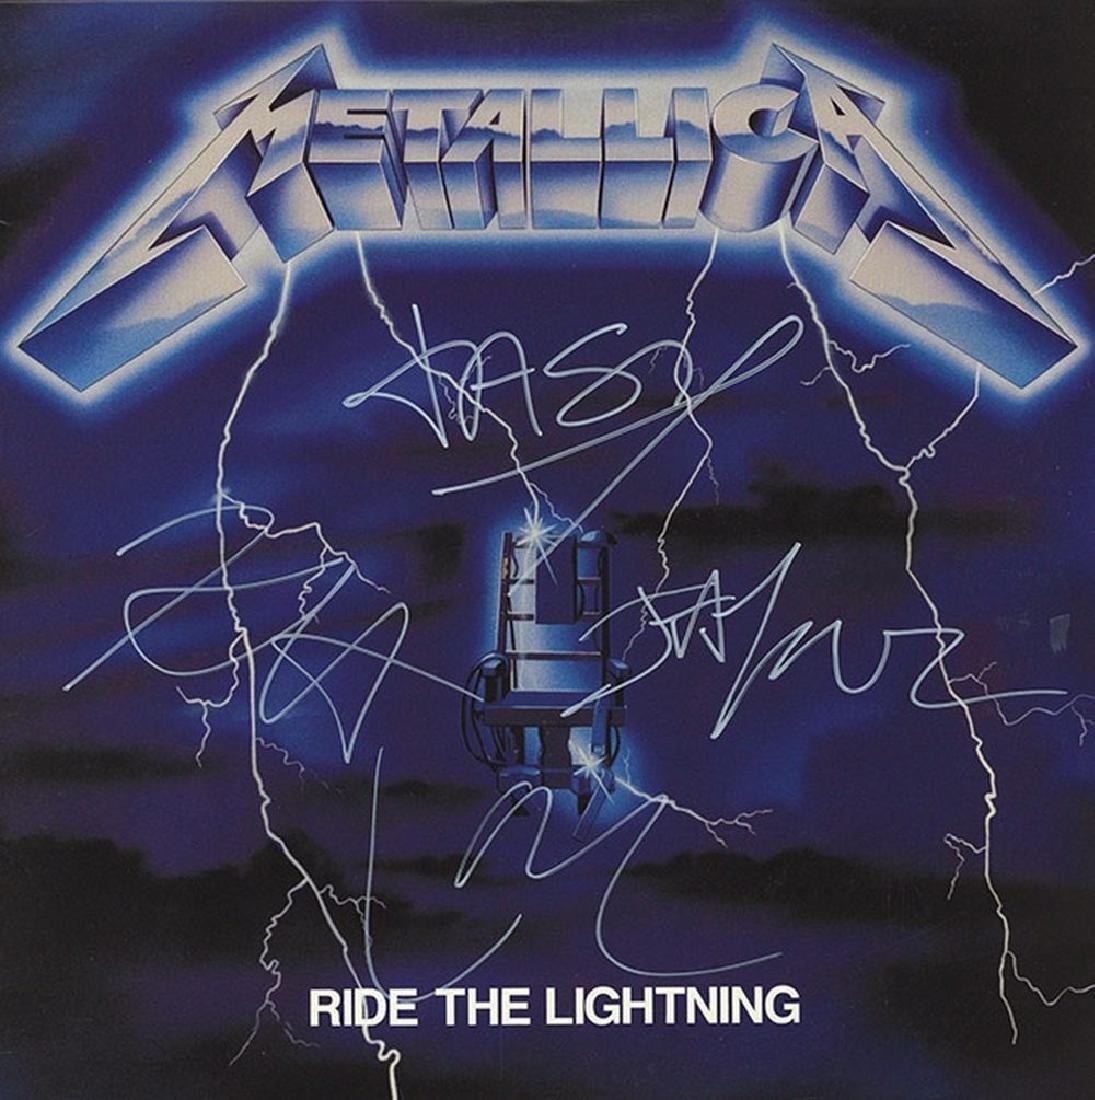 Metalllica Ride The Lightning Unframed Album